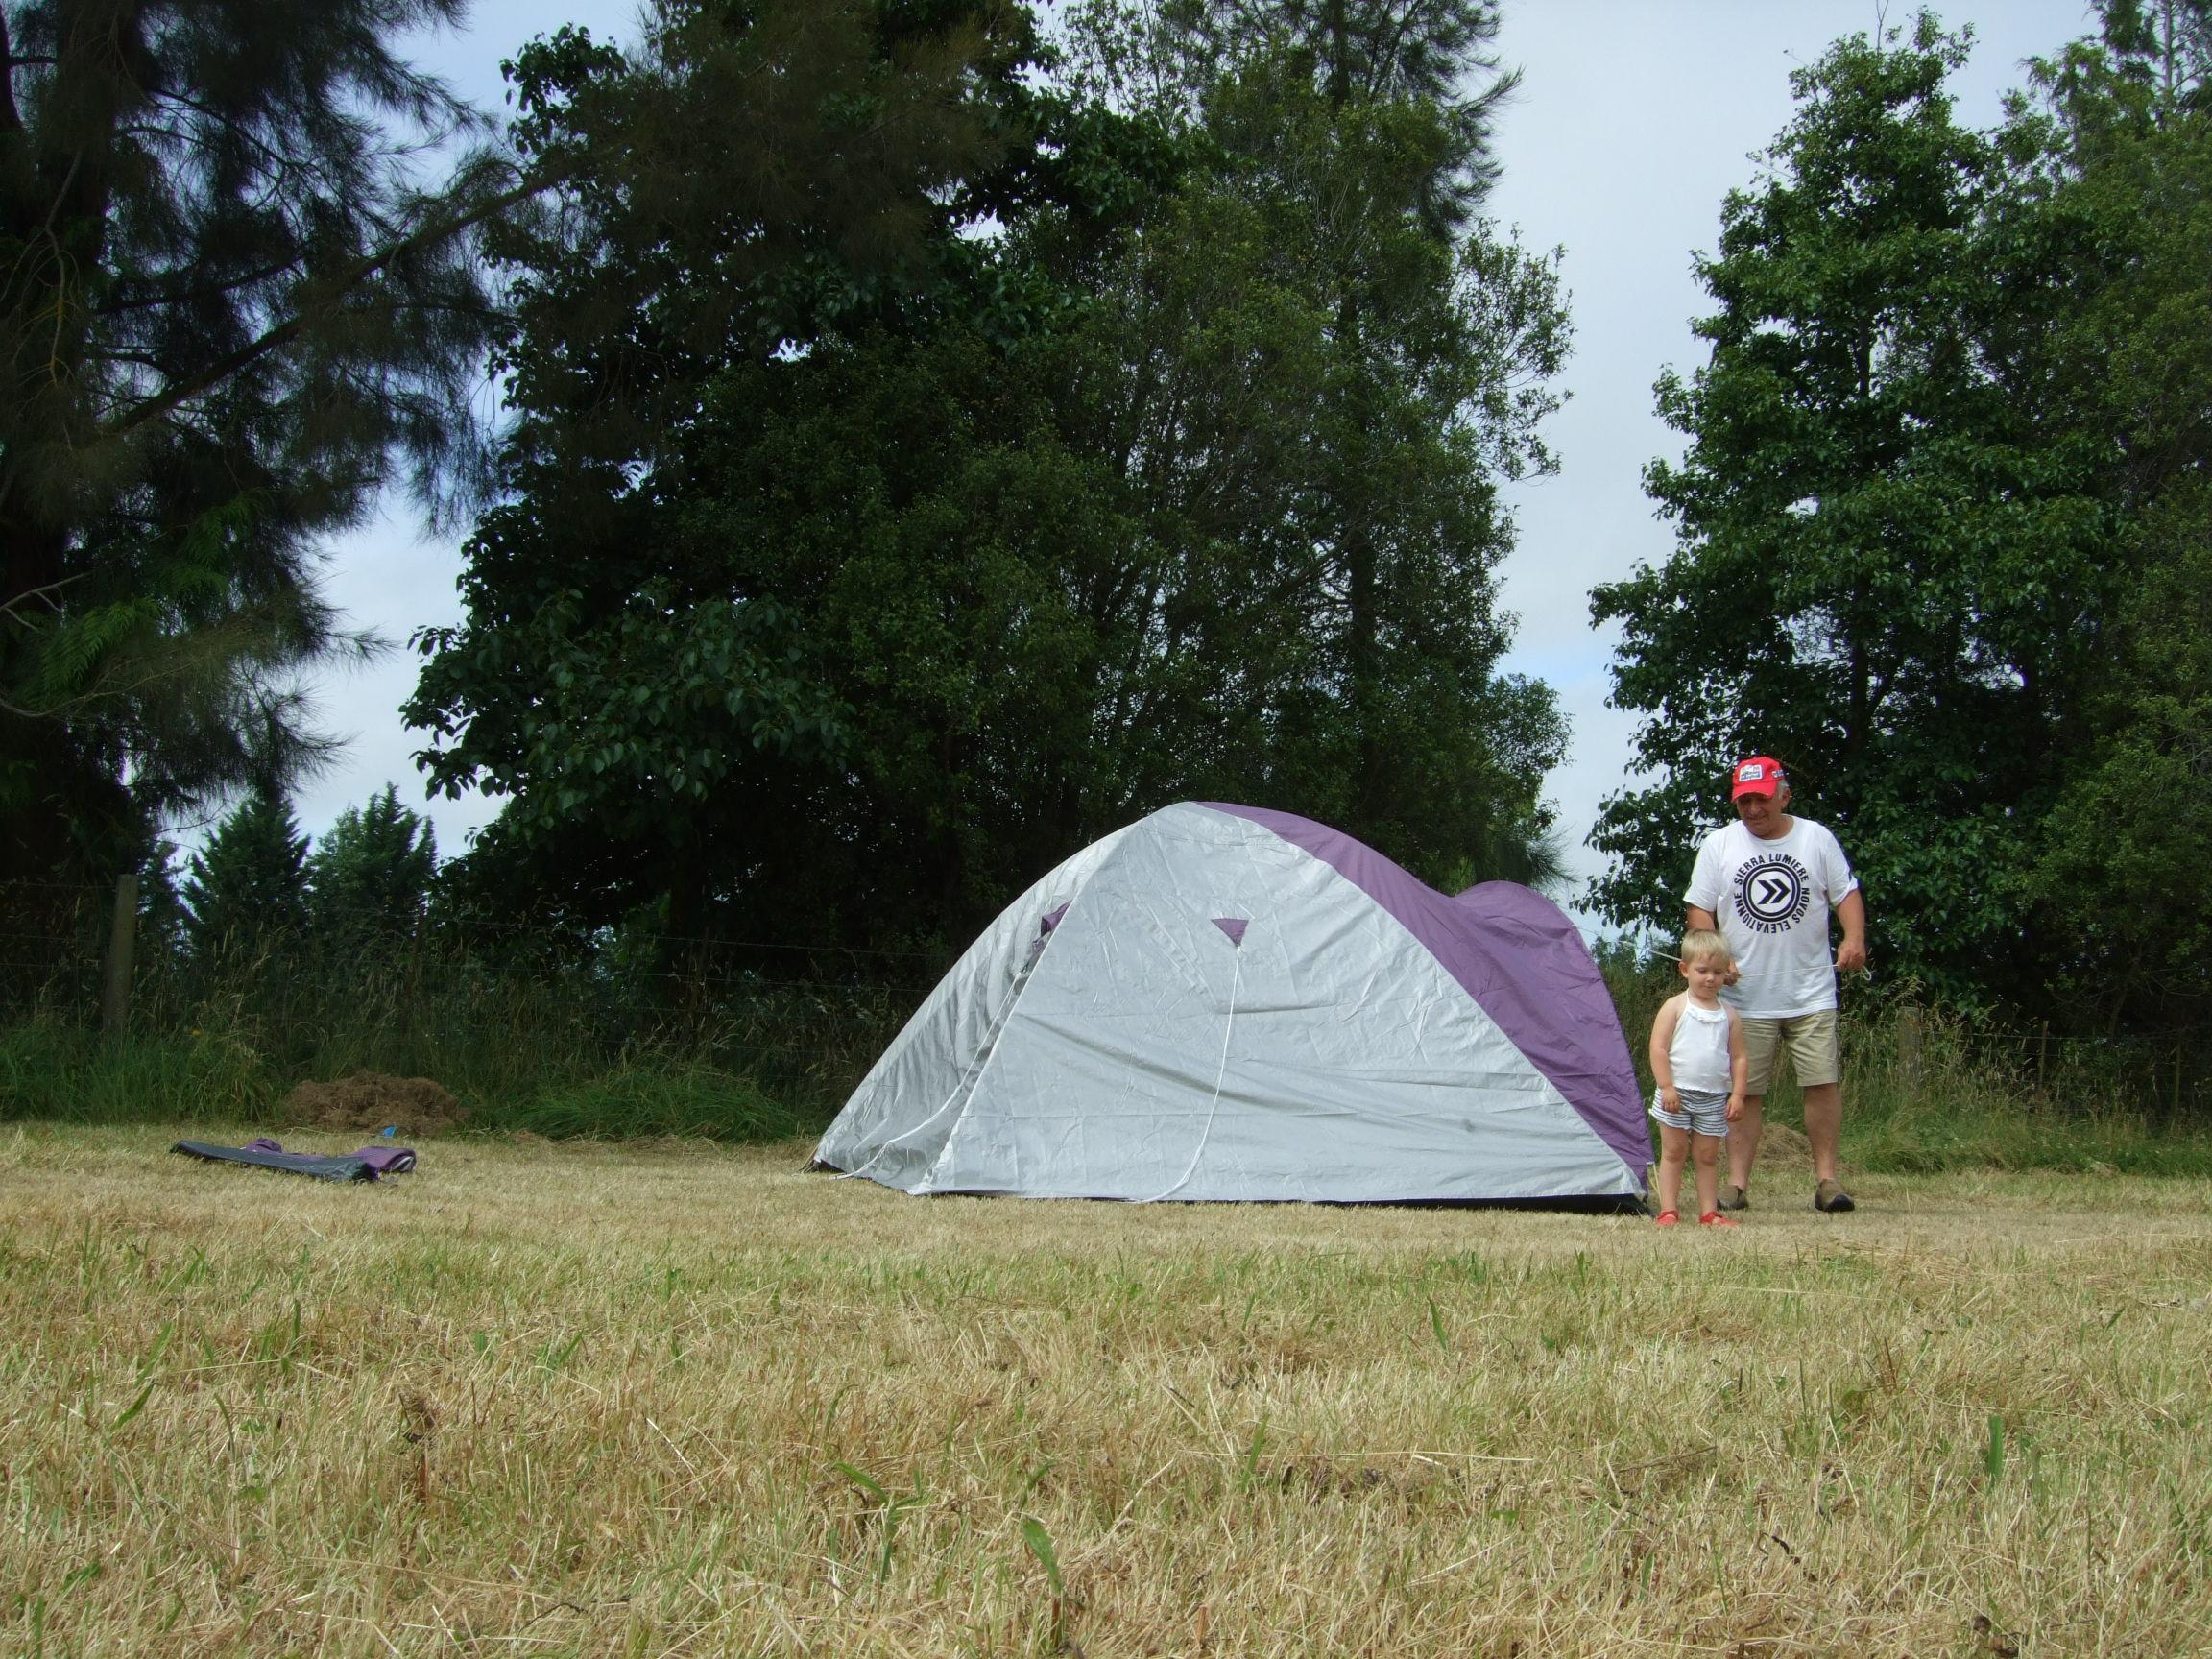 Yogi helps set up the tent